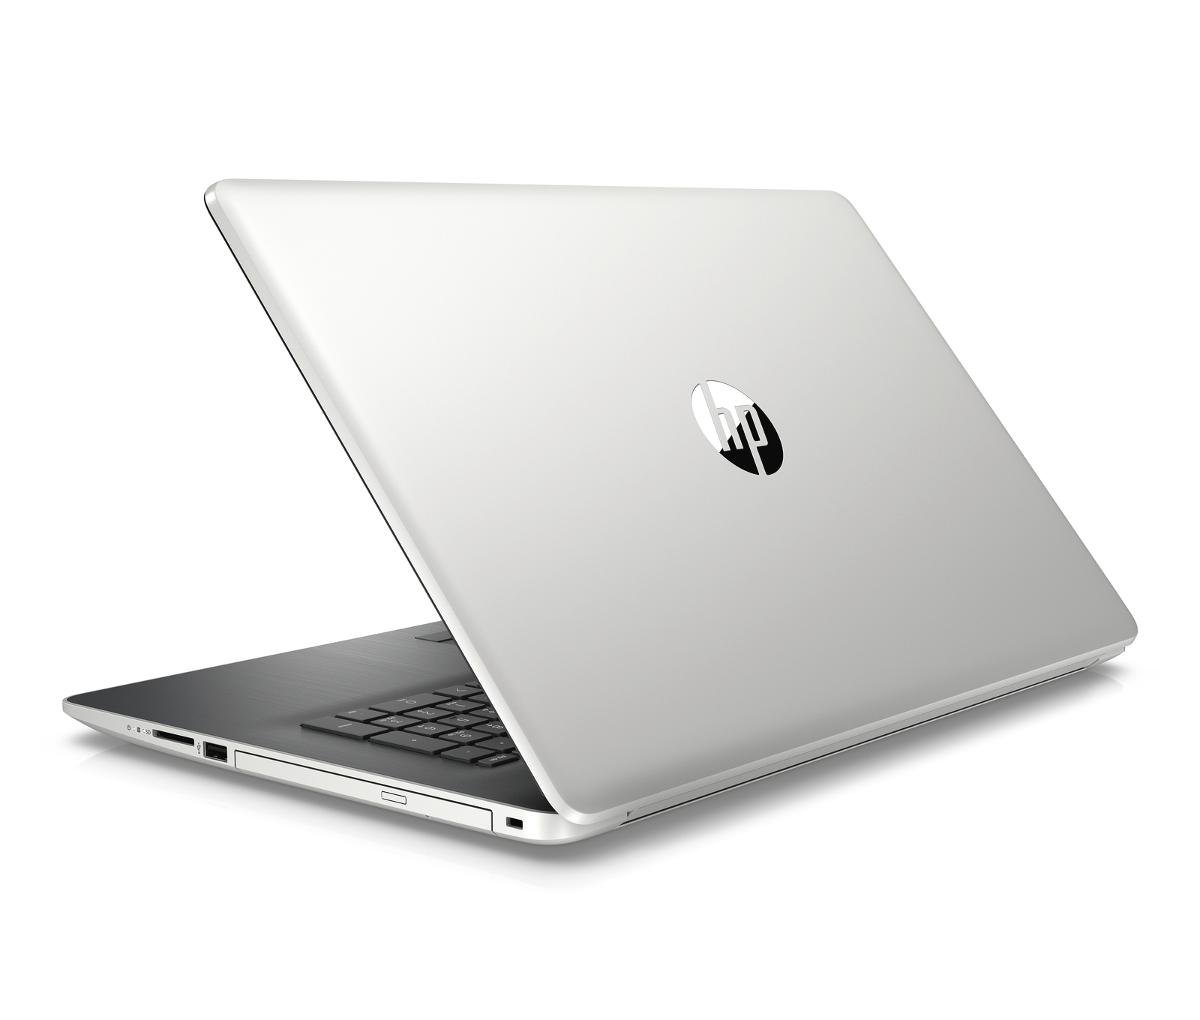 "Laptop HP 17 by0008nw 5KT99EA, i3-7020U, 4 GB RAM, 17,3"", 1 TB HDD, Windows 10 Home"